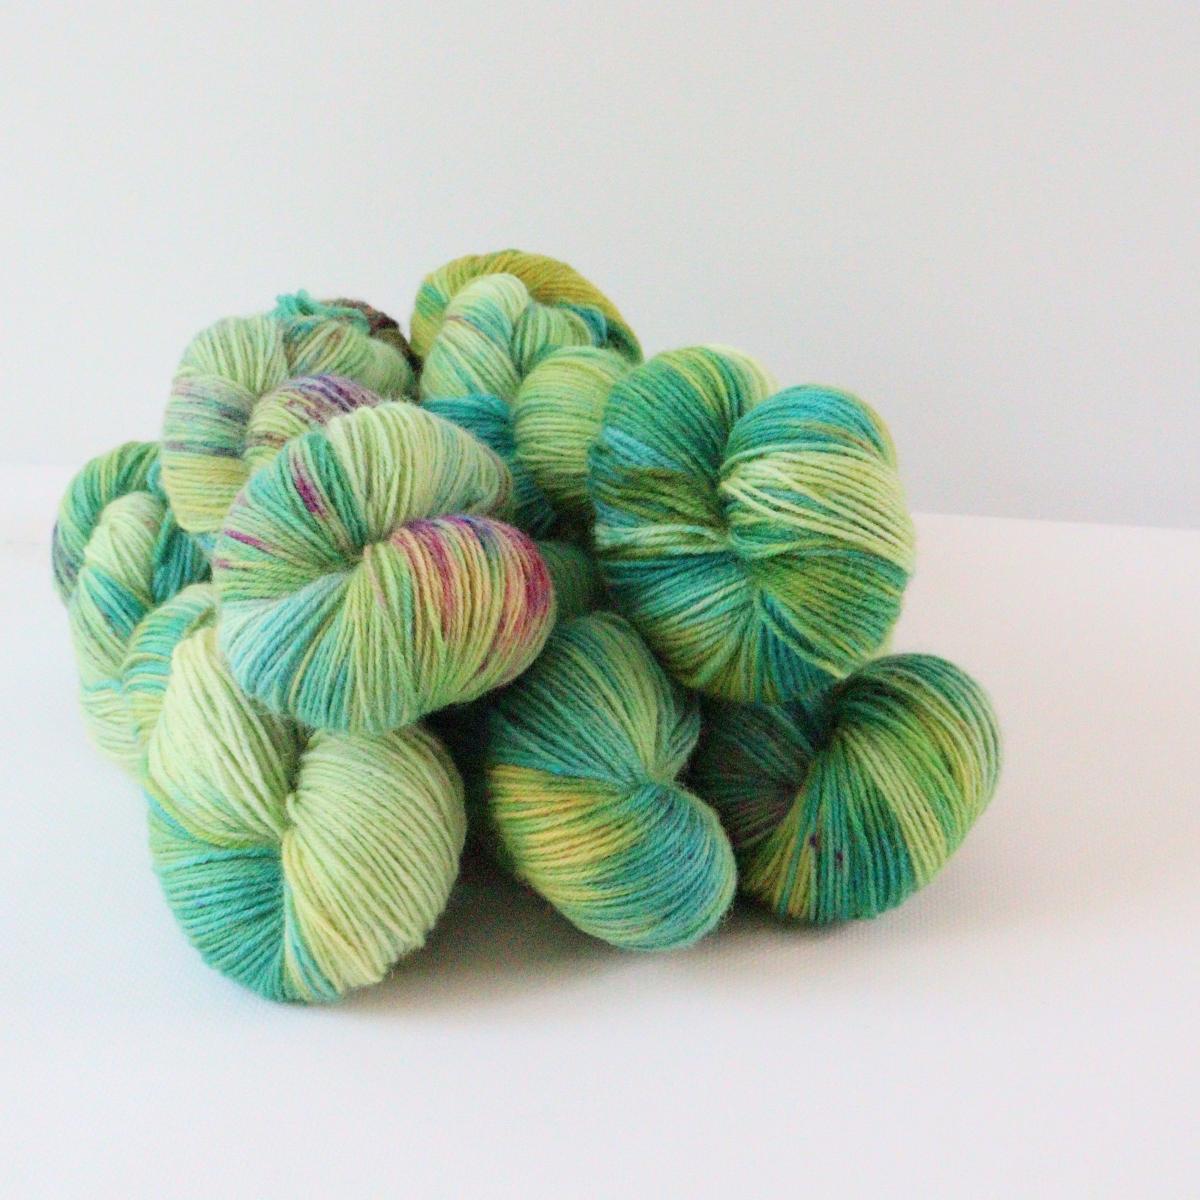 woodico.pro hand dyed yarn 080 1200x1200 - Hand dyed yarn / 080